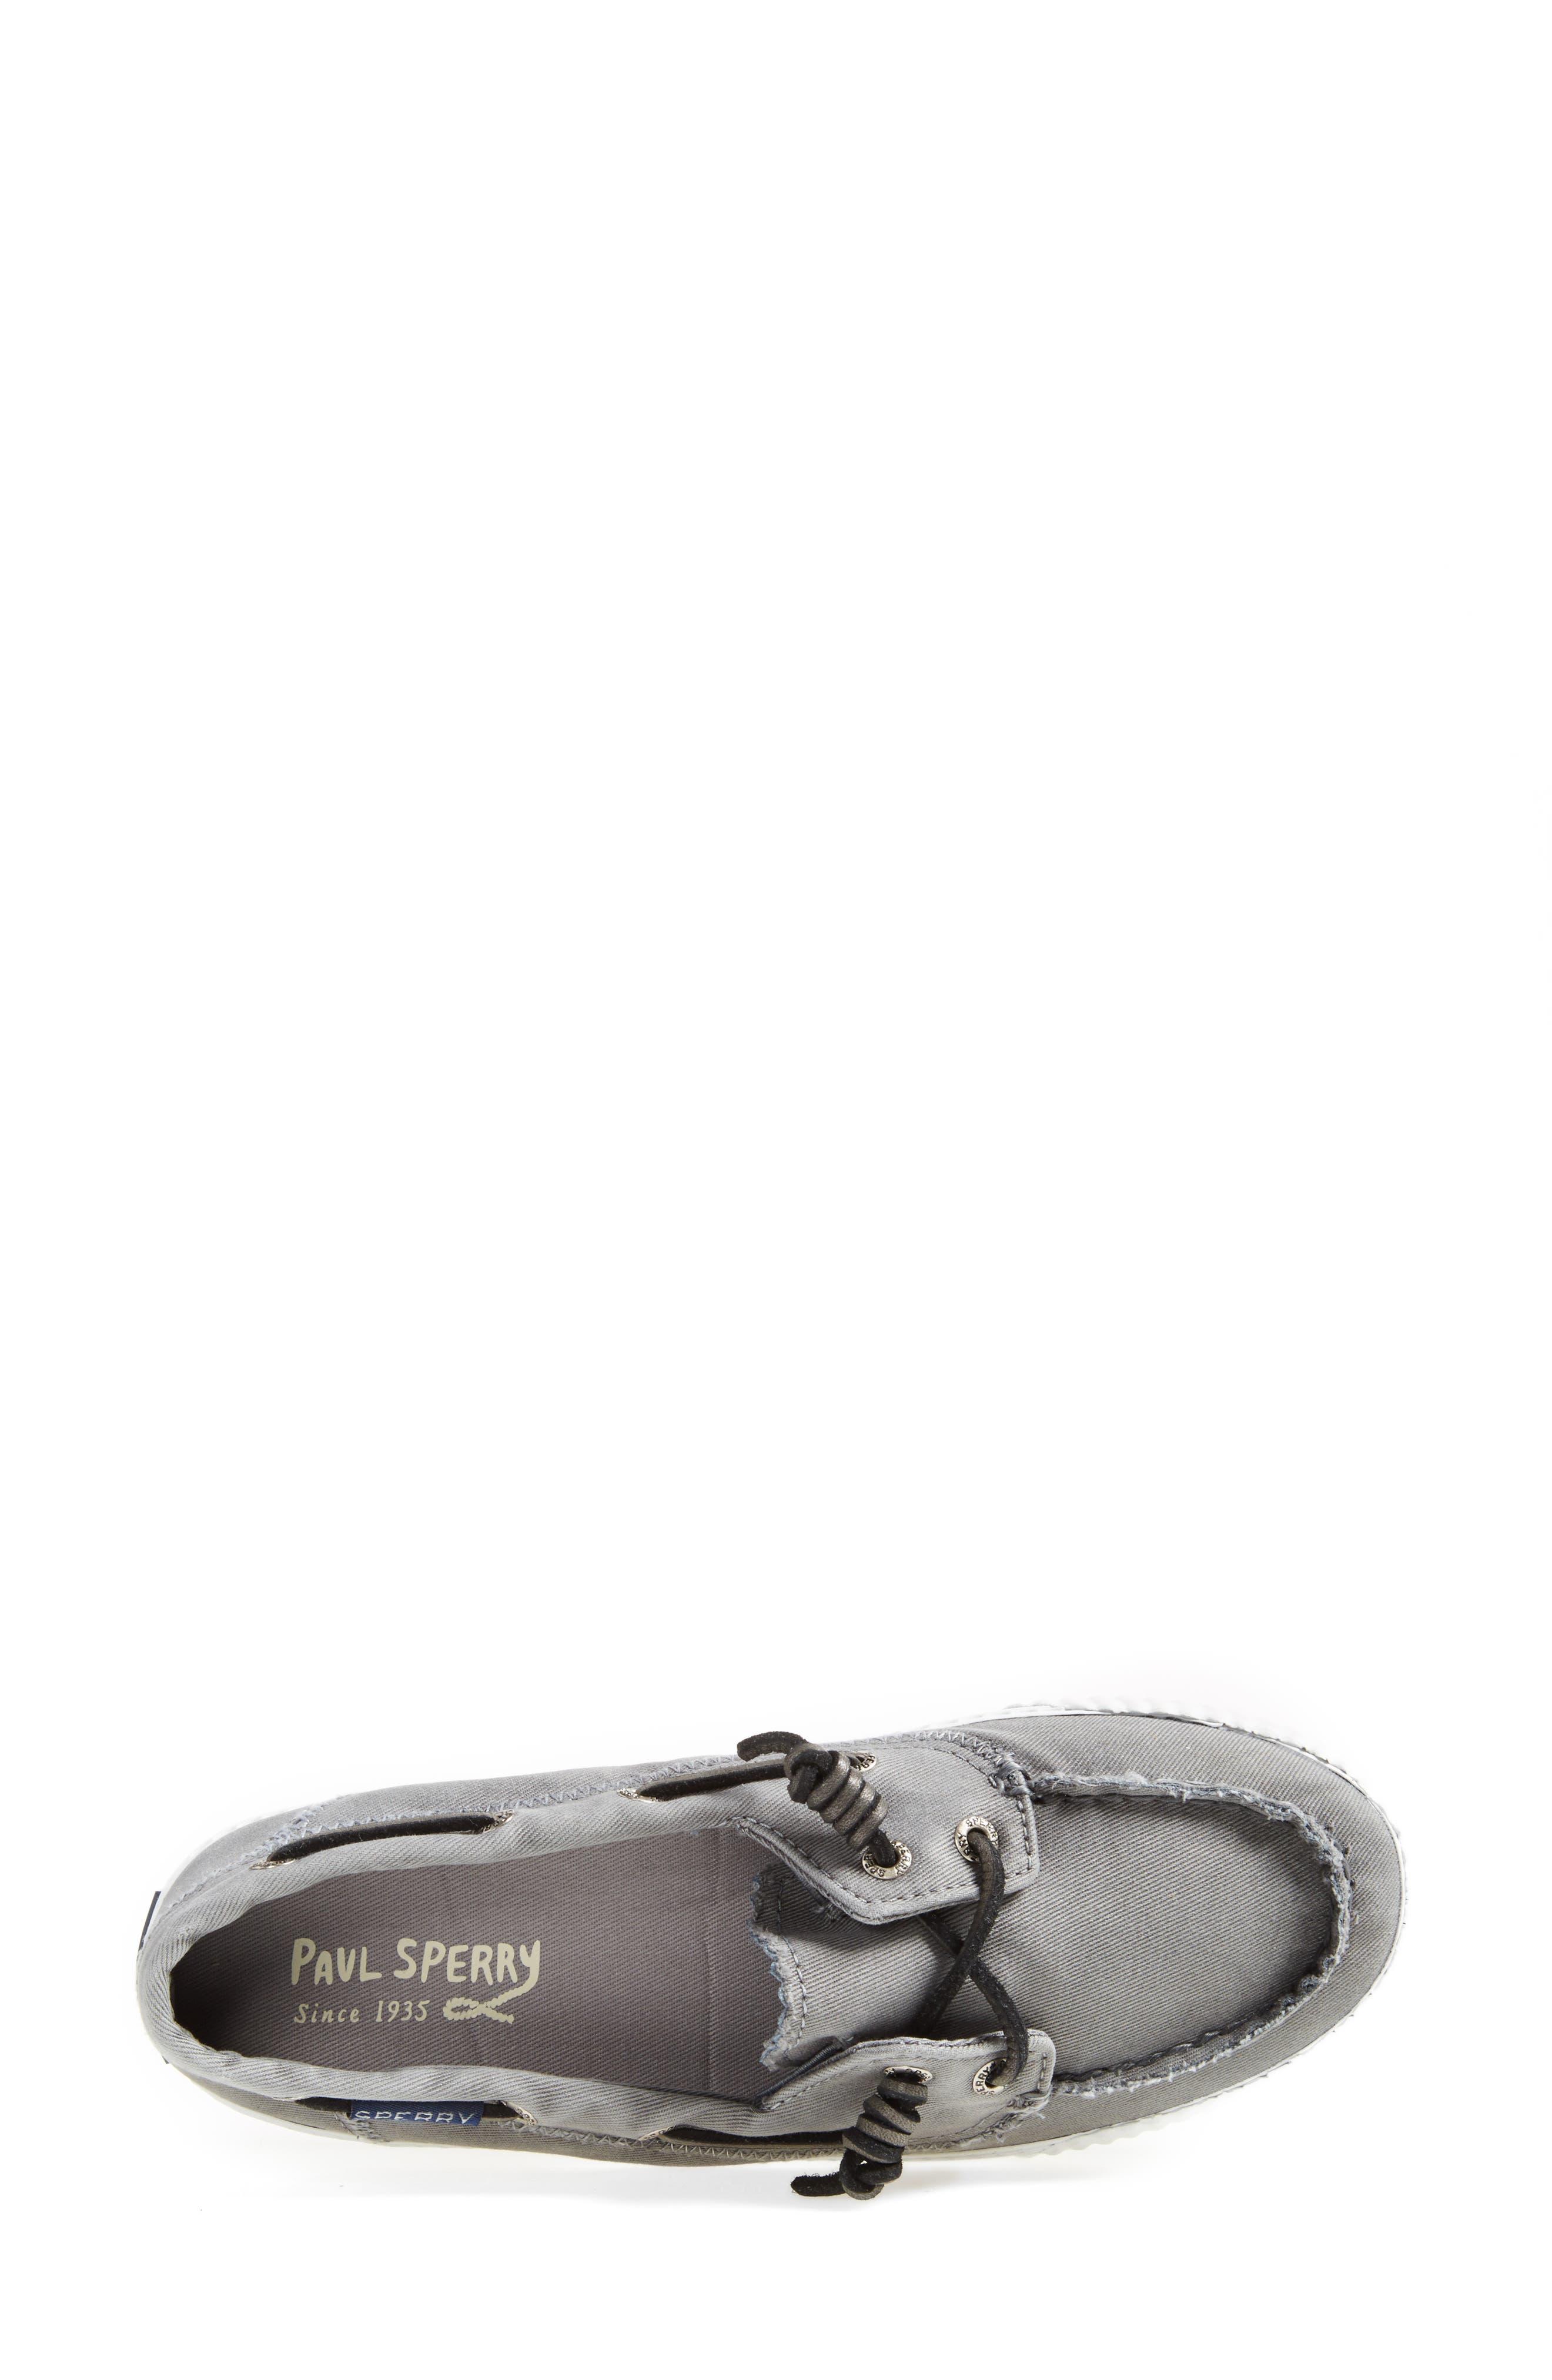 Paul Sperry 'Sayel Away' Sneaker,                             Alternate thumbnail 4, color,                             GREY